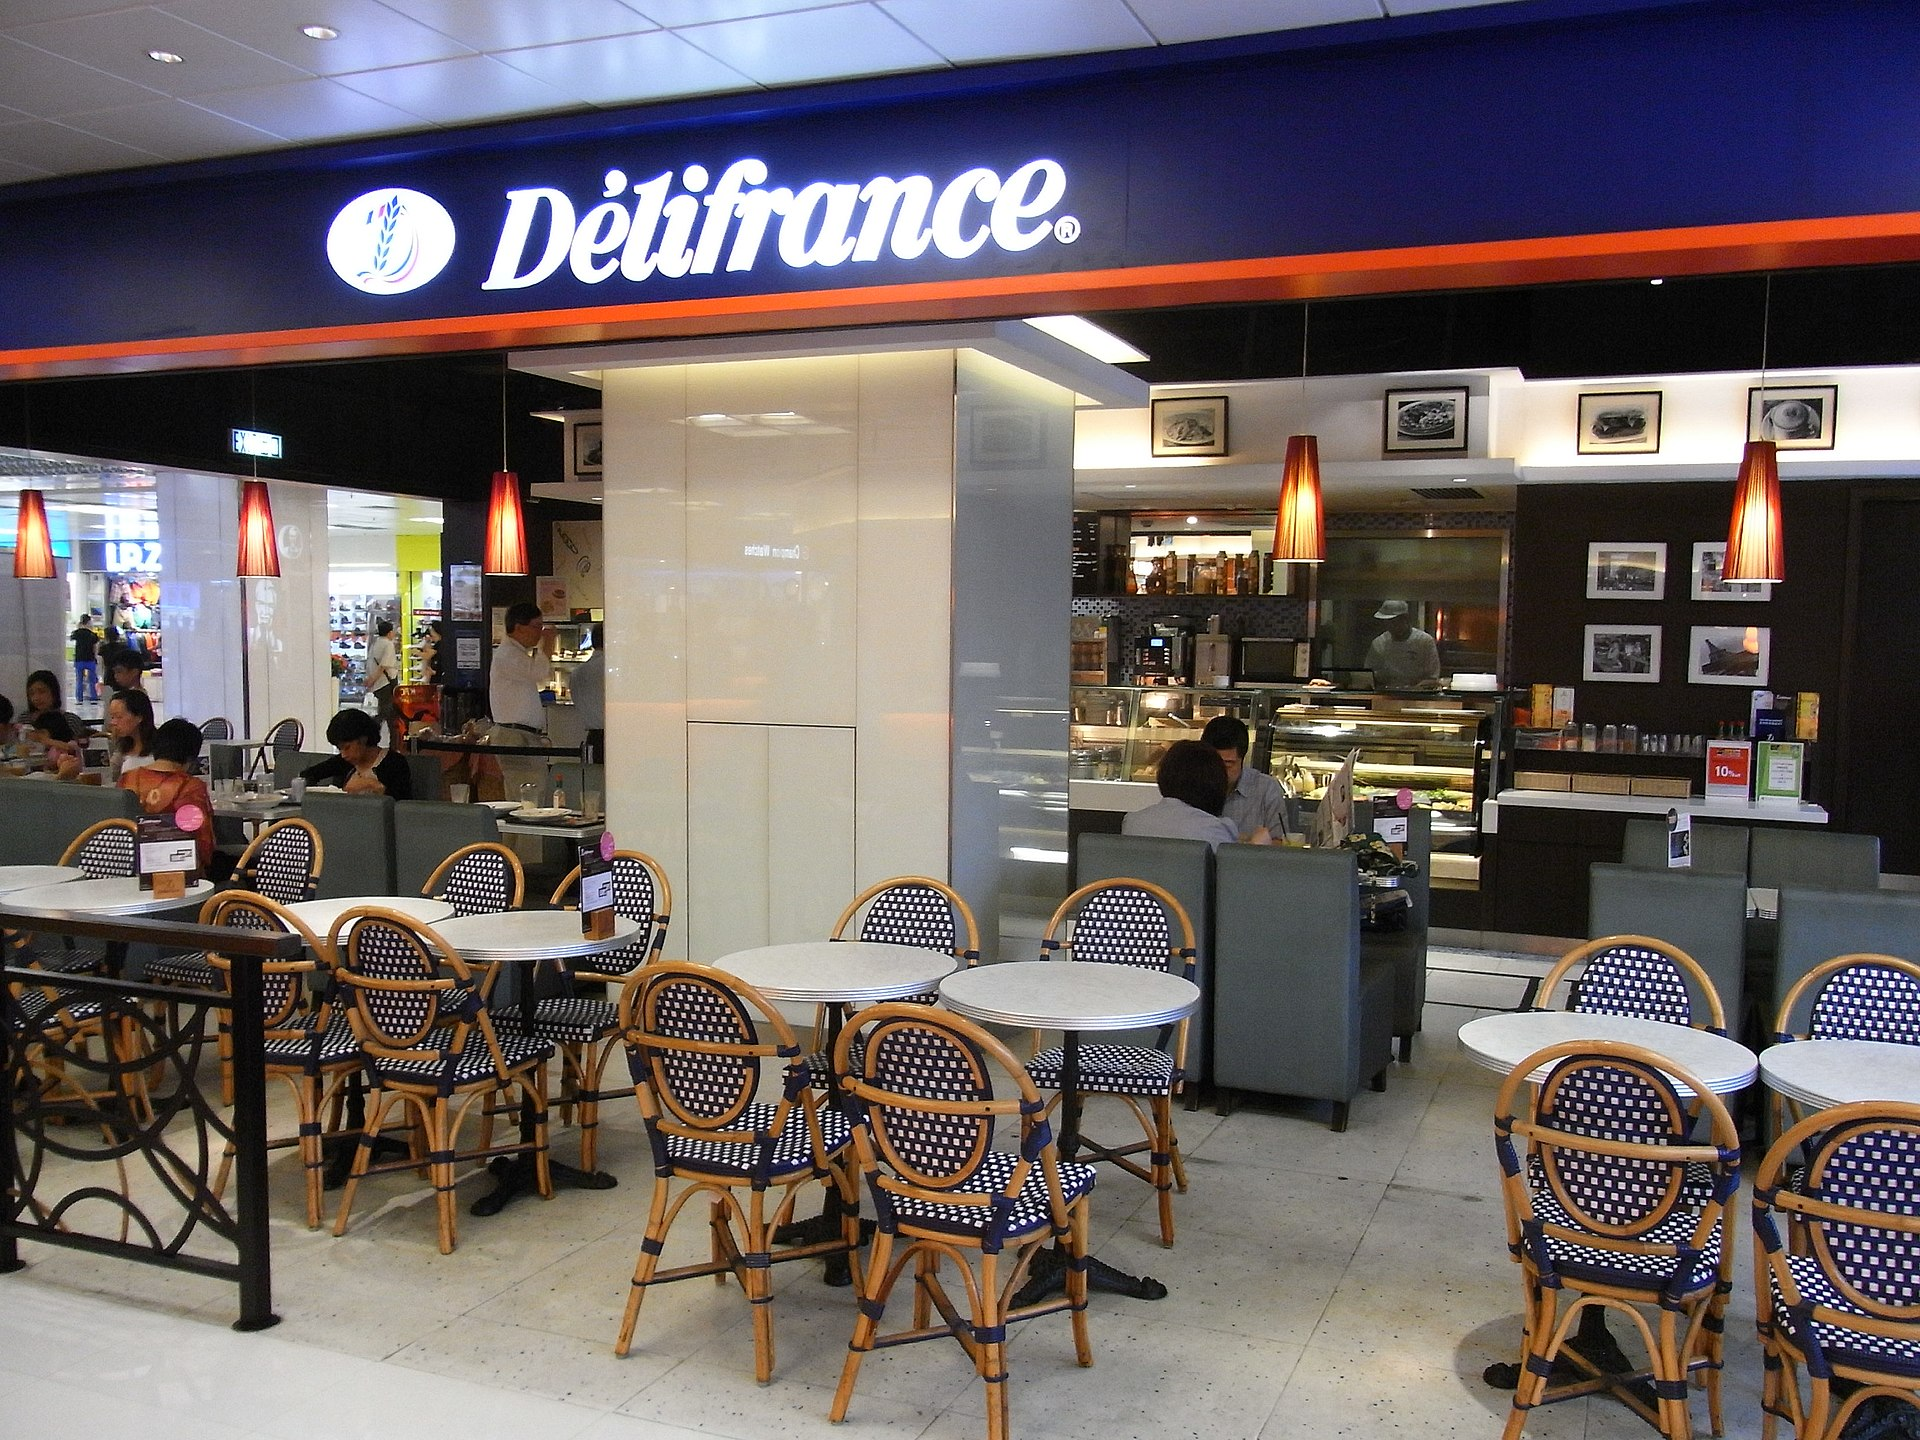 Direction Des Restaurants Universitaire Nice